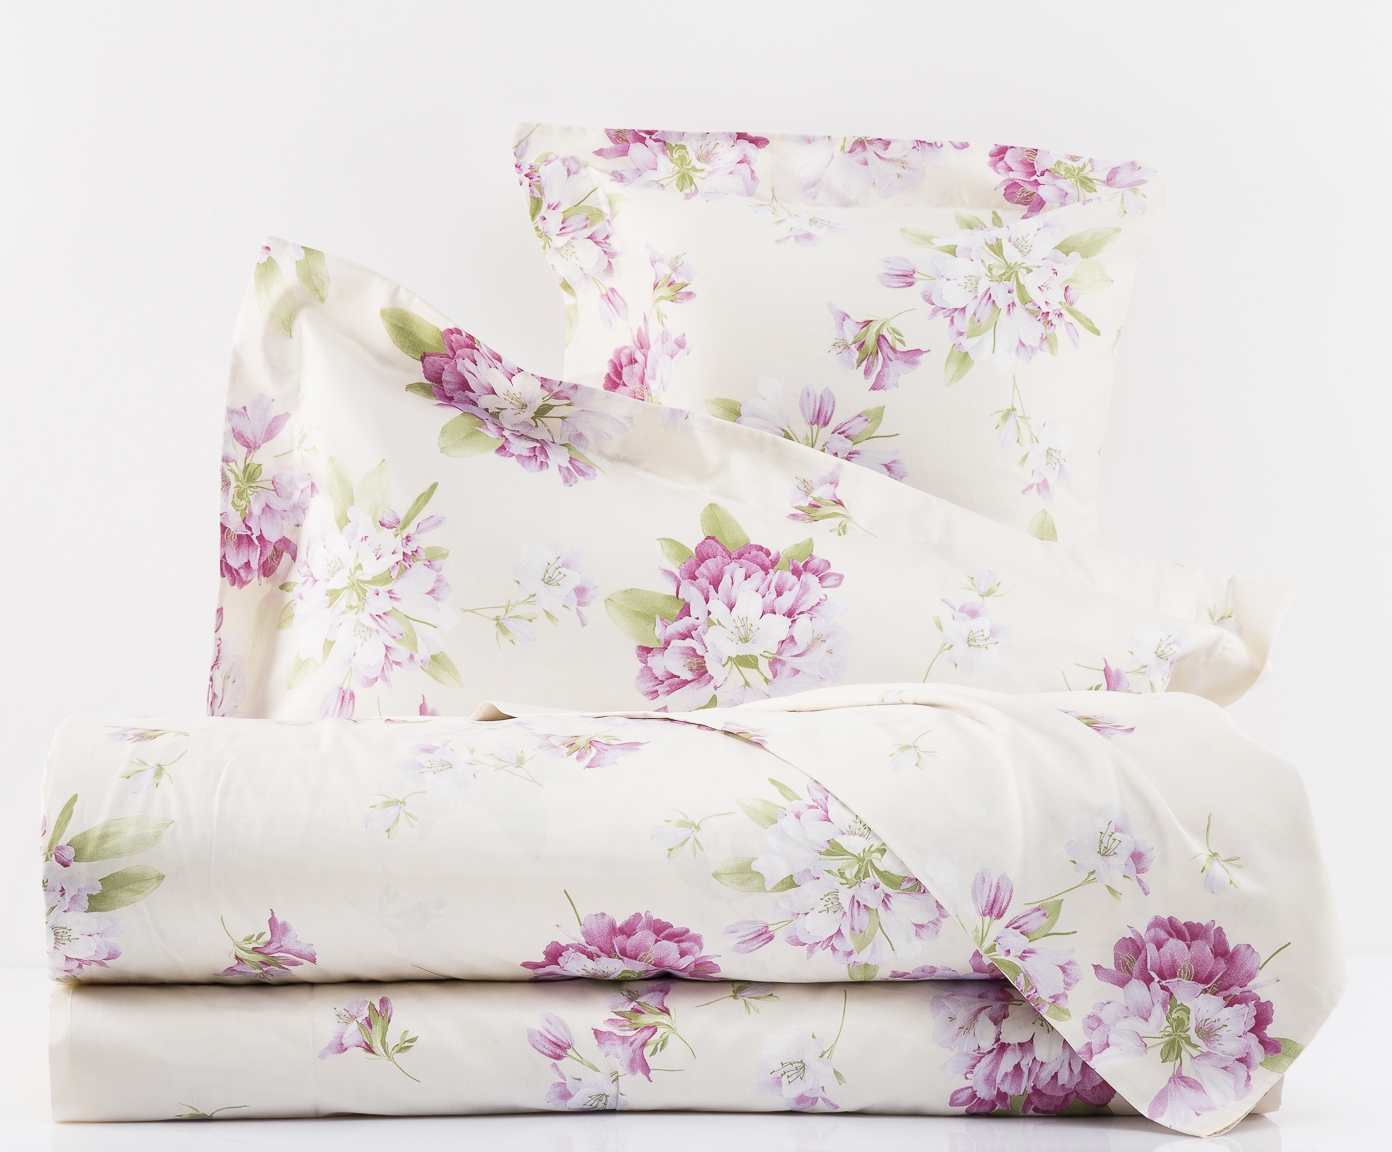 Постельное Постельное белье 2 спальное Mirabello Rododendri с розовыми цветами postelnoe-belie-mirabello-rododendri-s-rozovymi-tsvetami-italiya.jpg